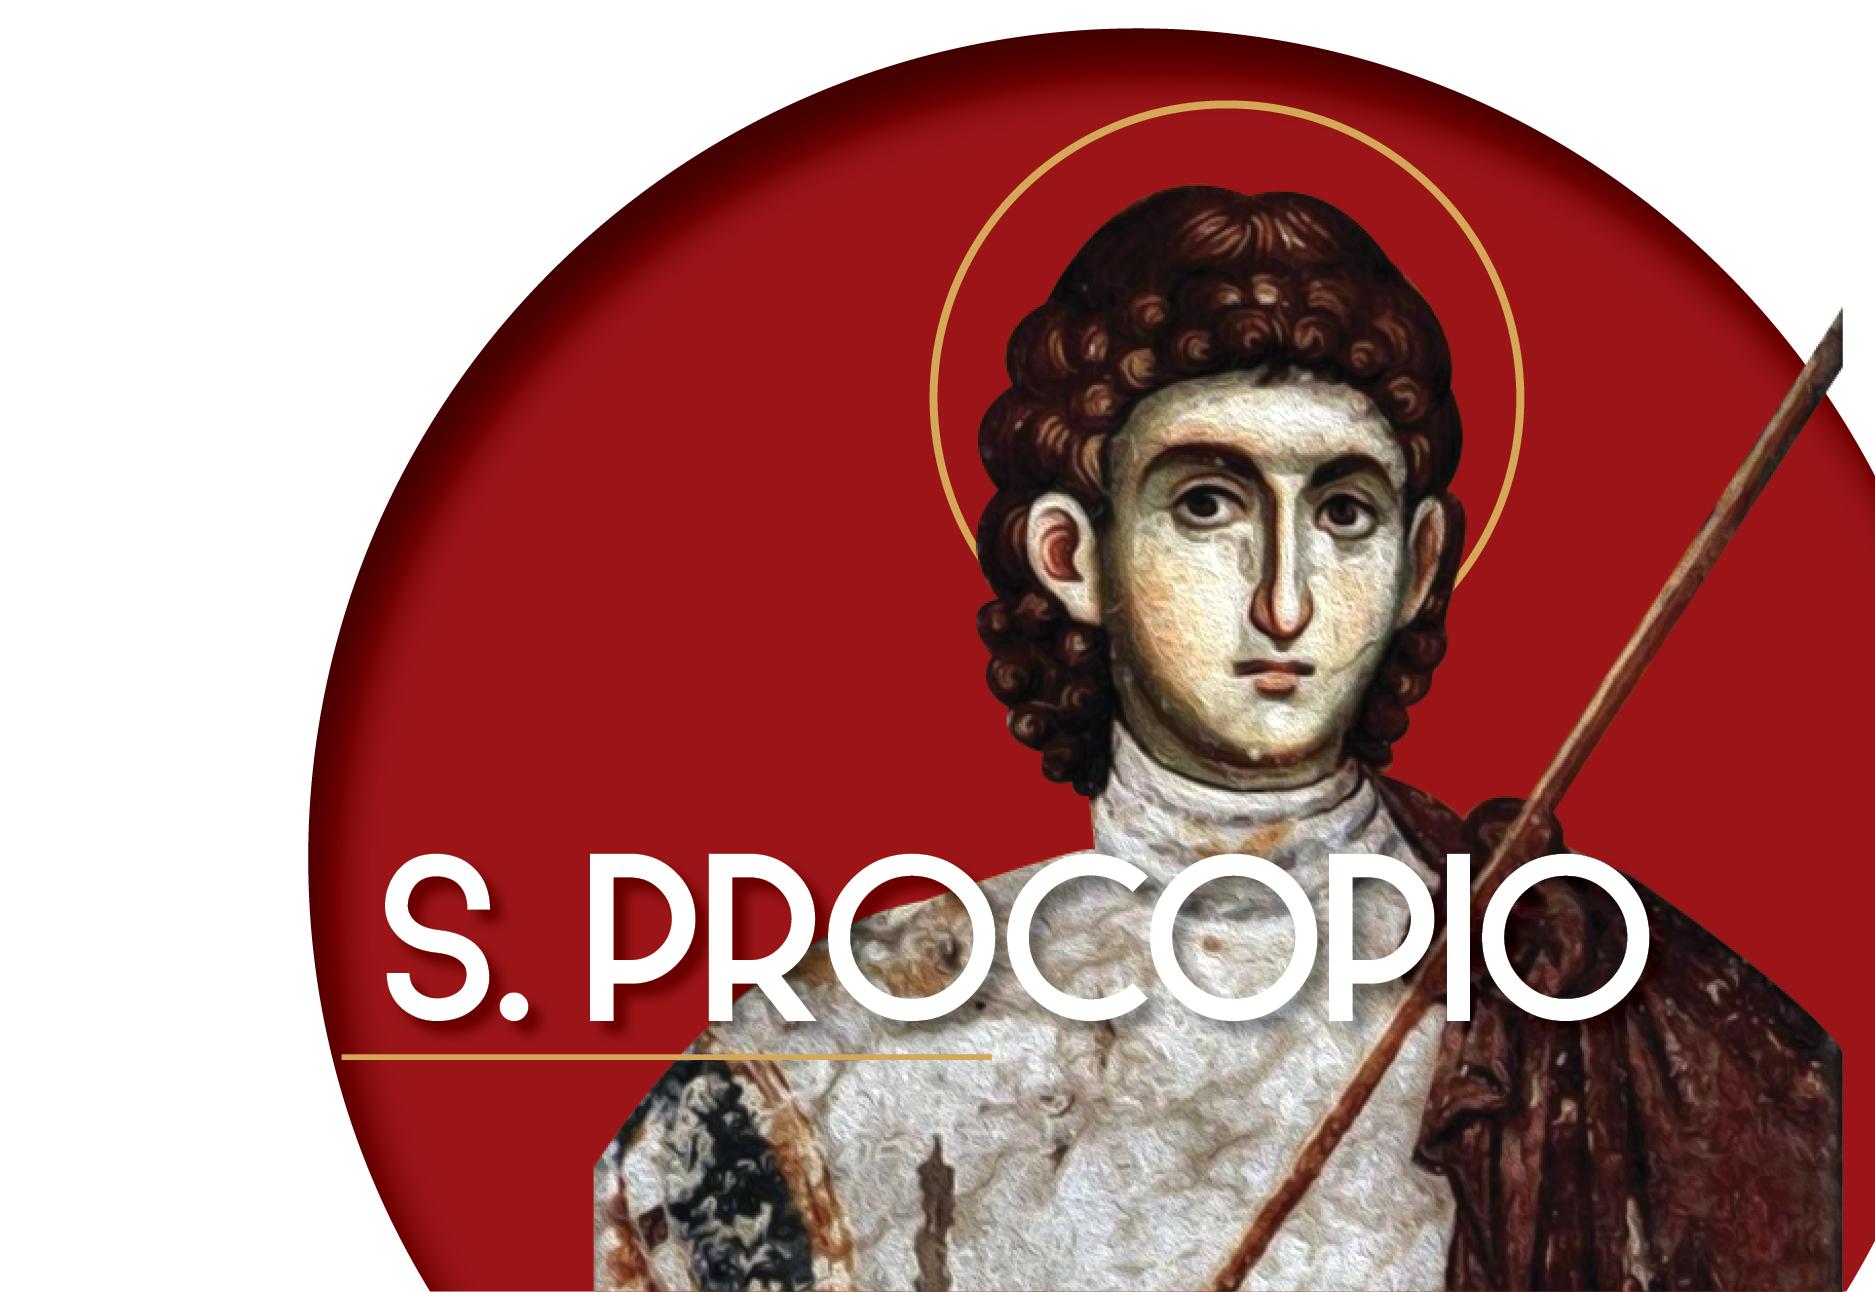 s. procopio